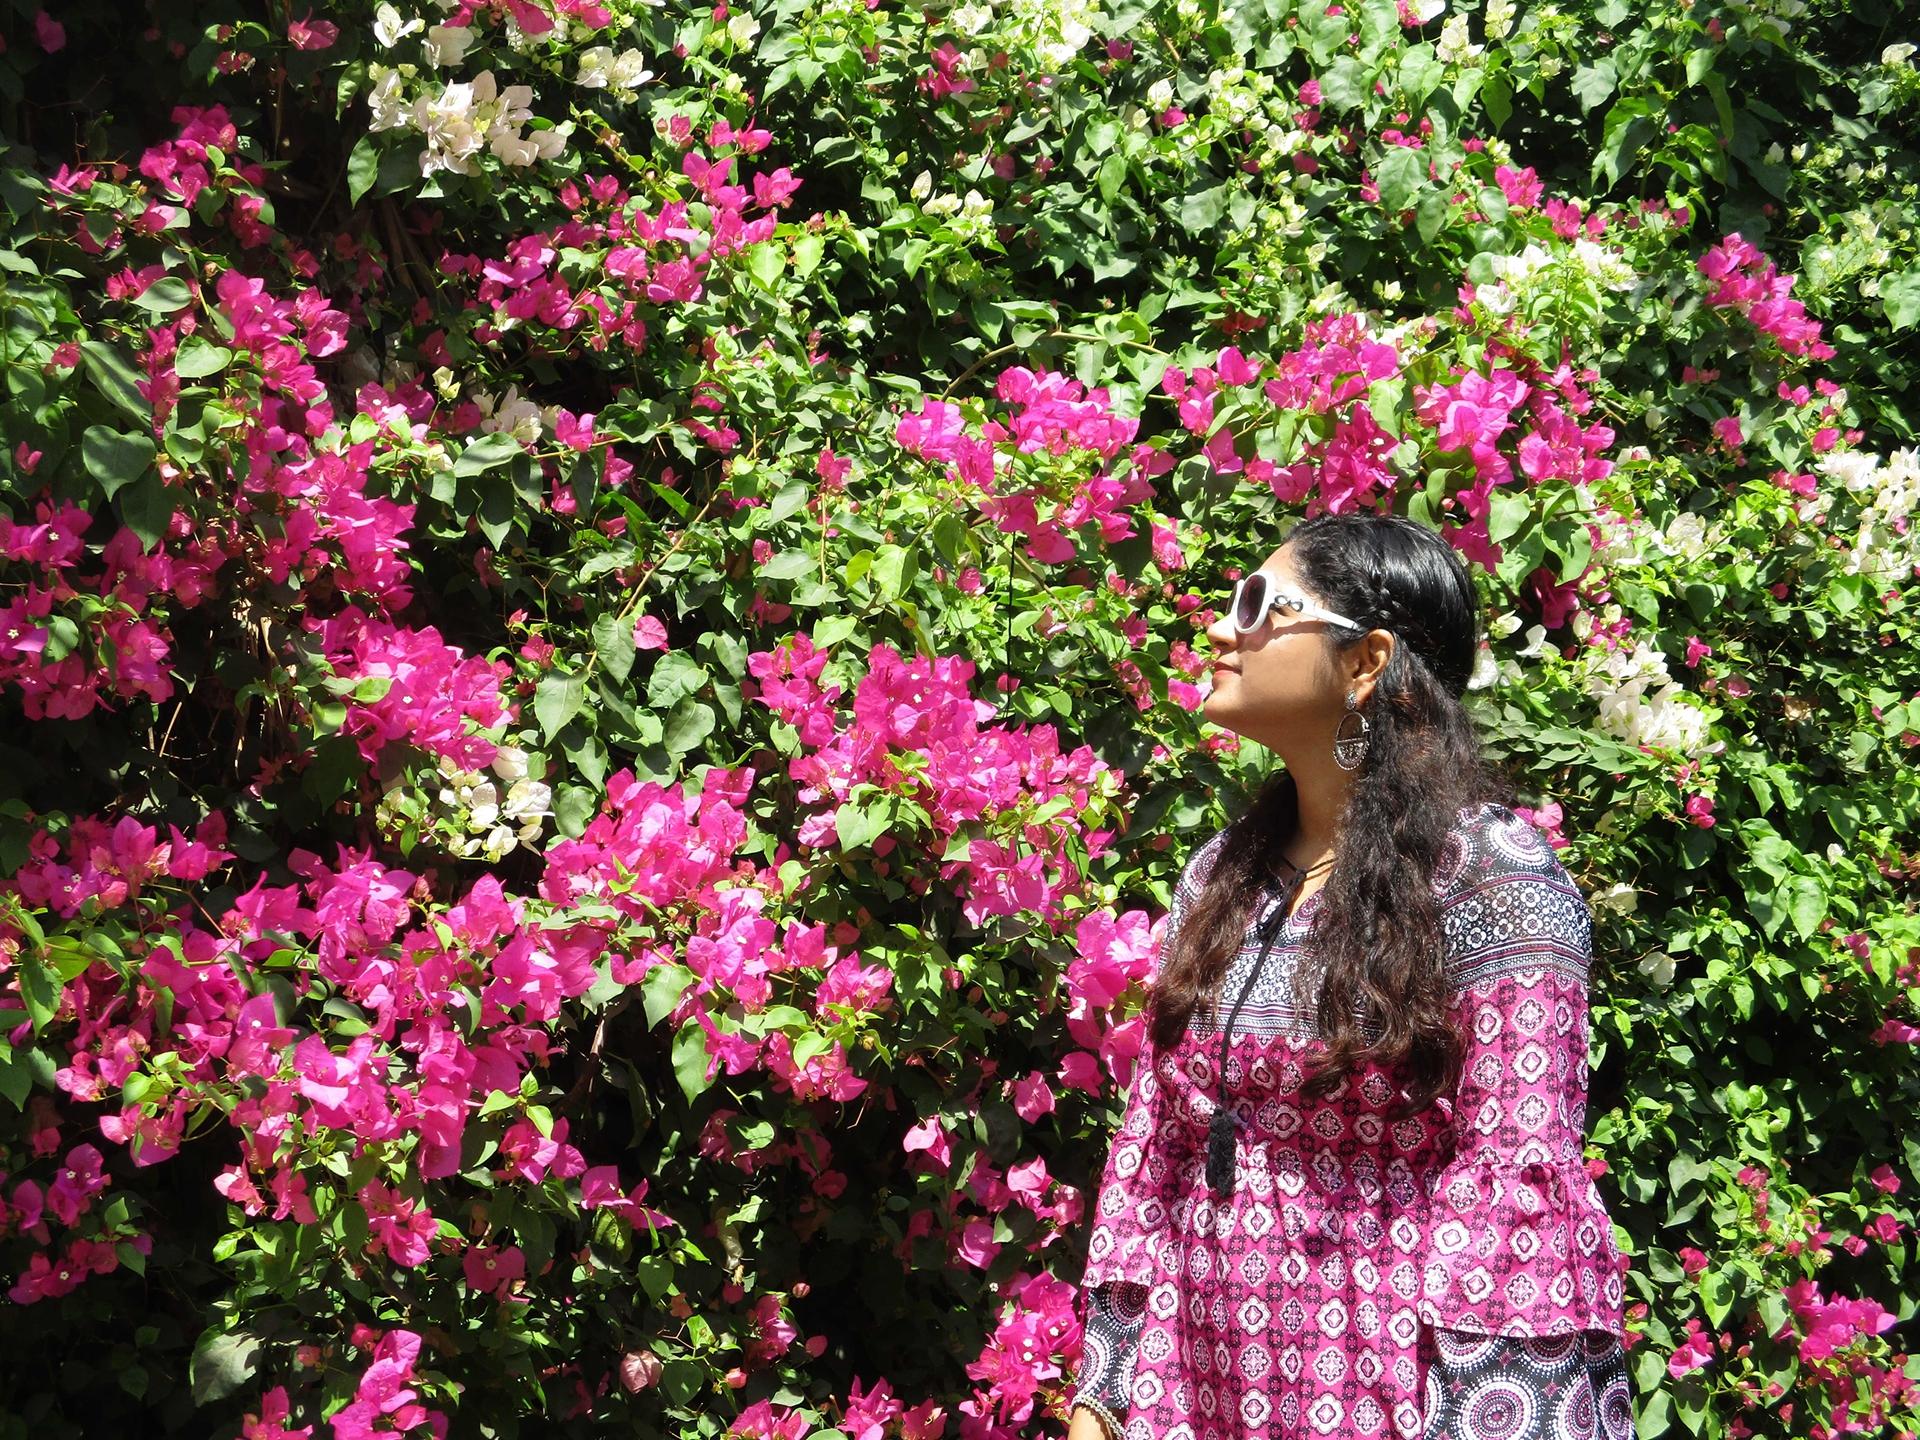 bohemian dress flowers